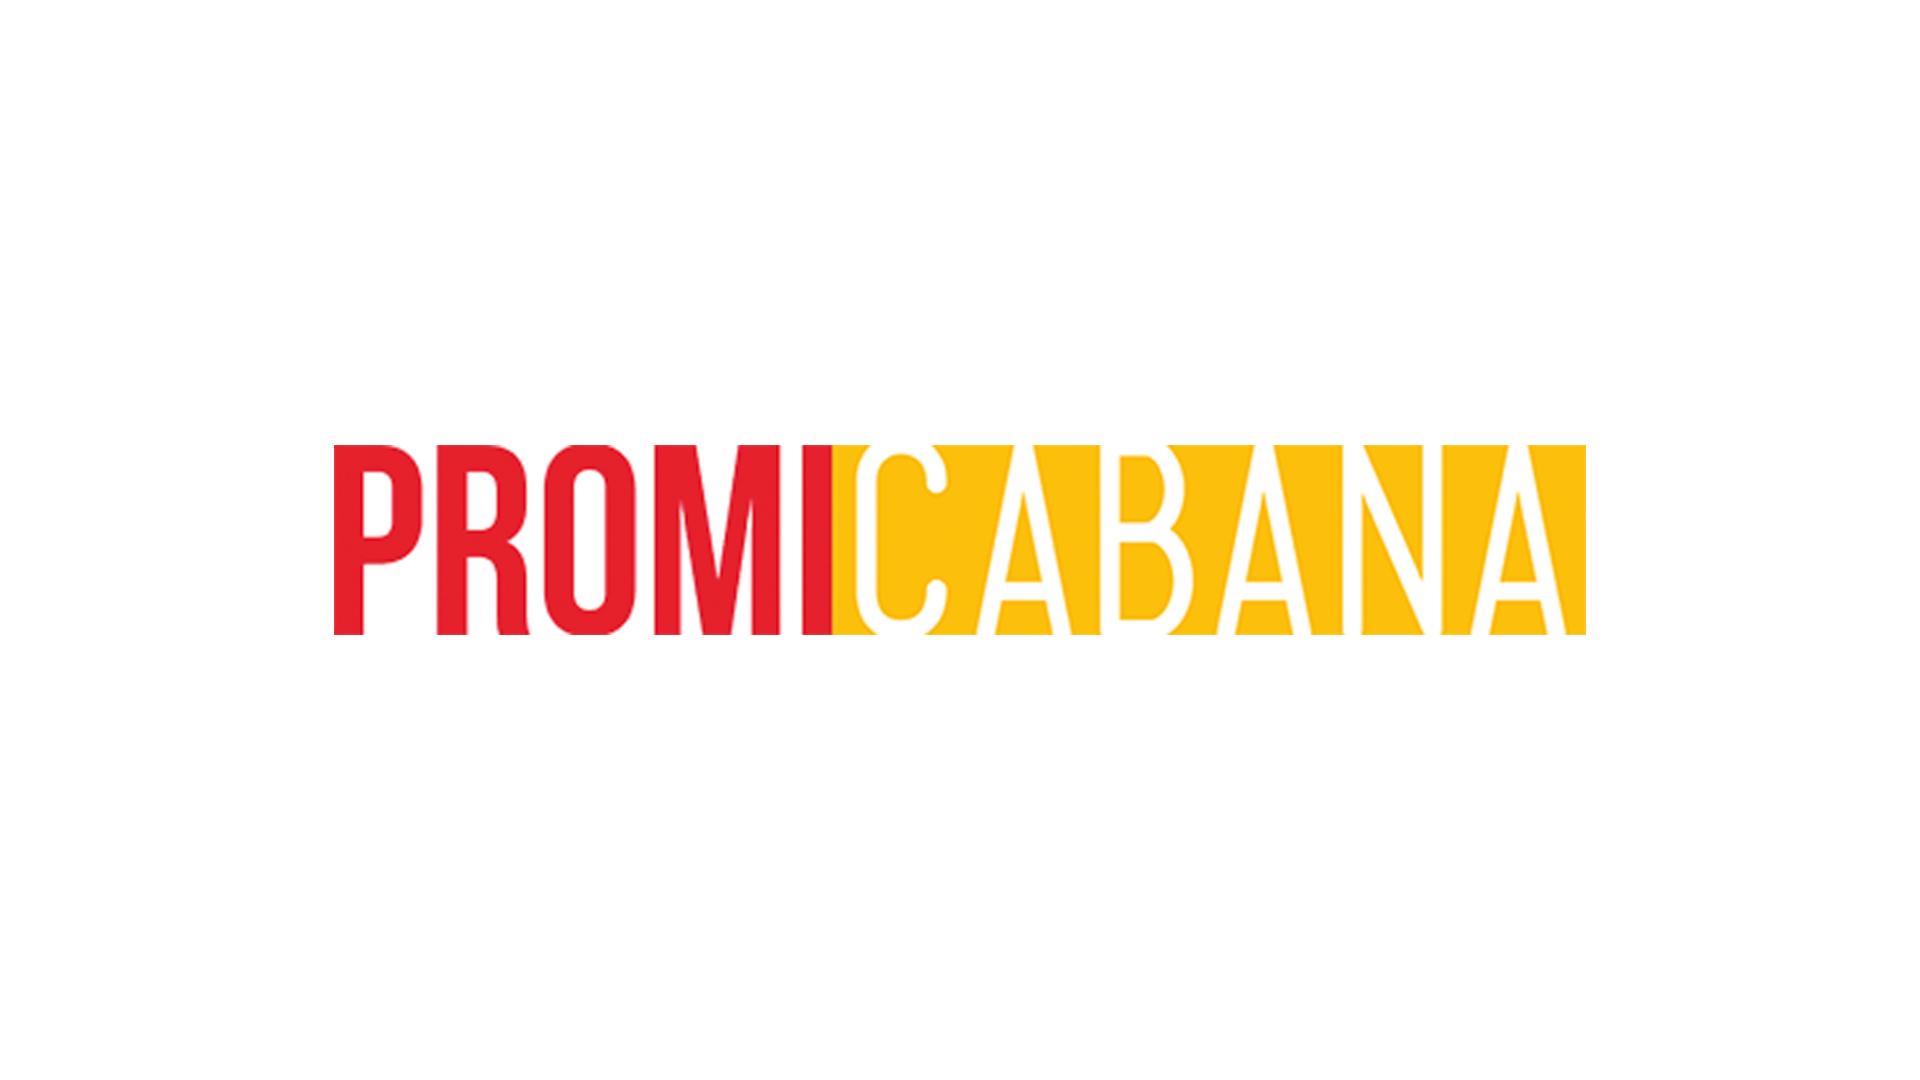 The-Walking-Dead-Super-Bowl